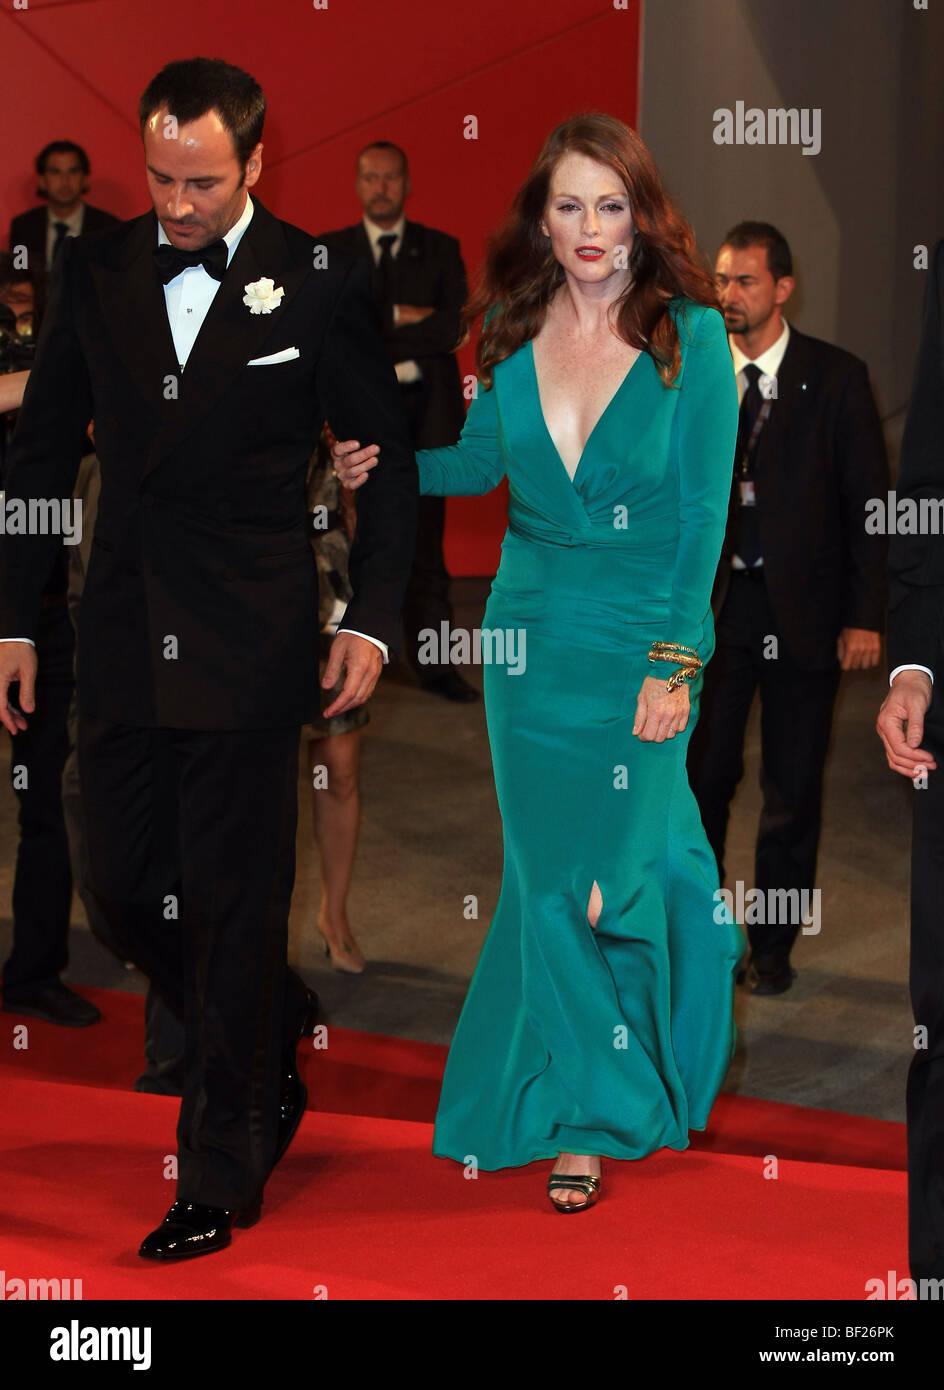 Tom Ford Julianne Moore A Single Man Premiere 66th Venice